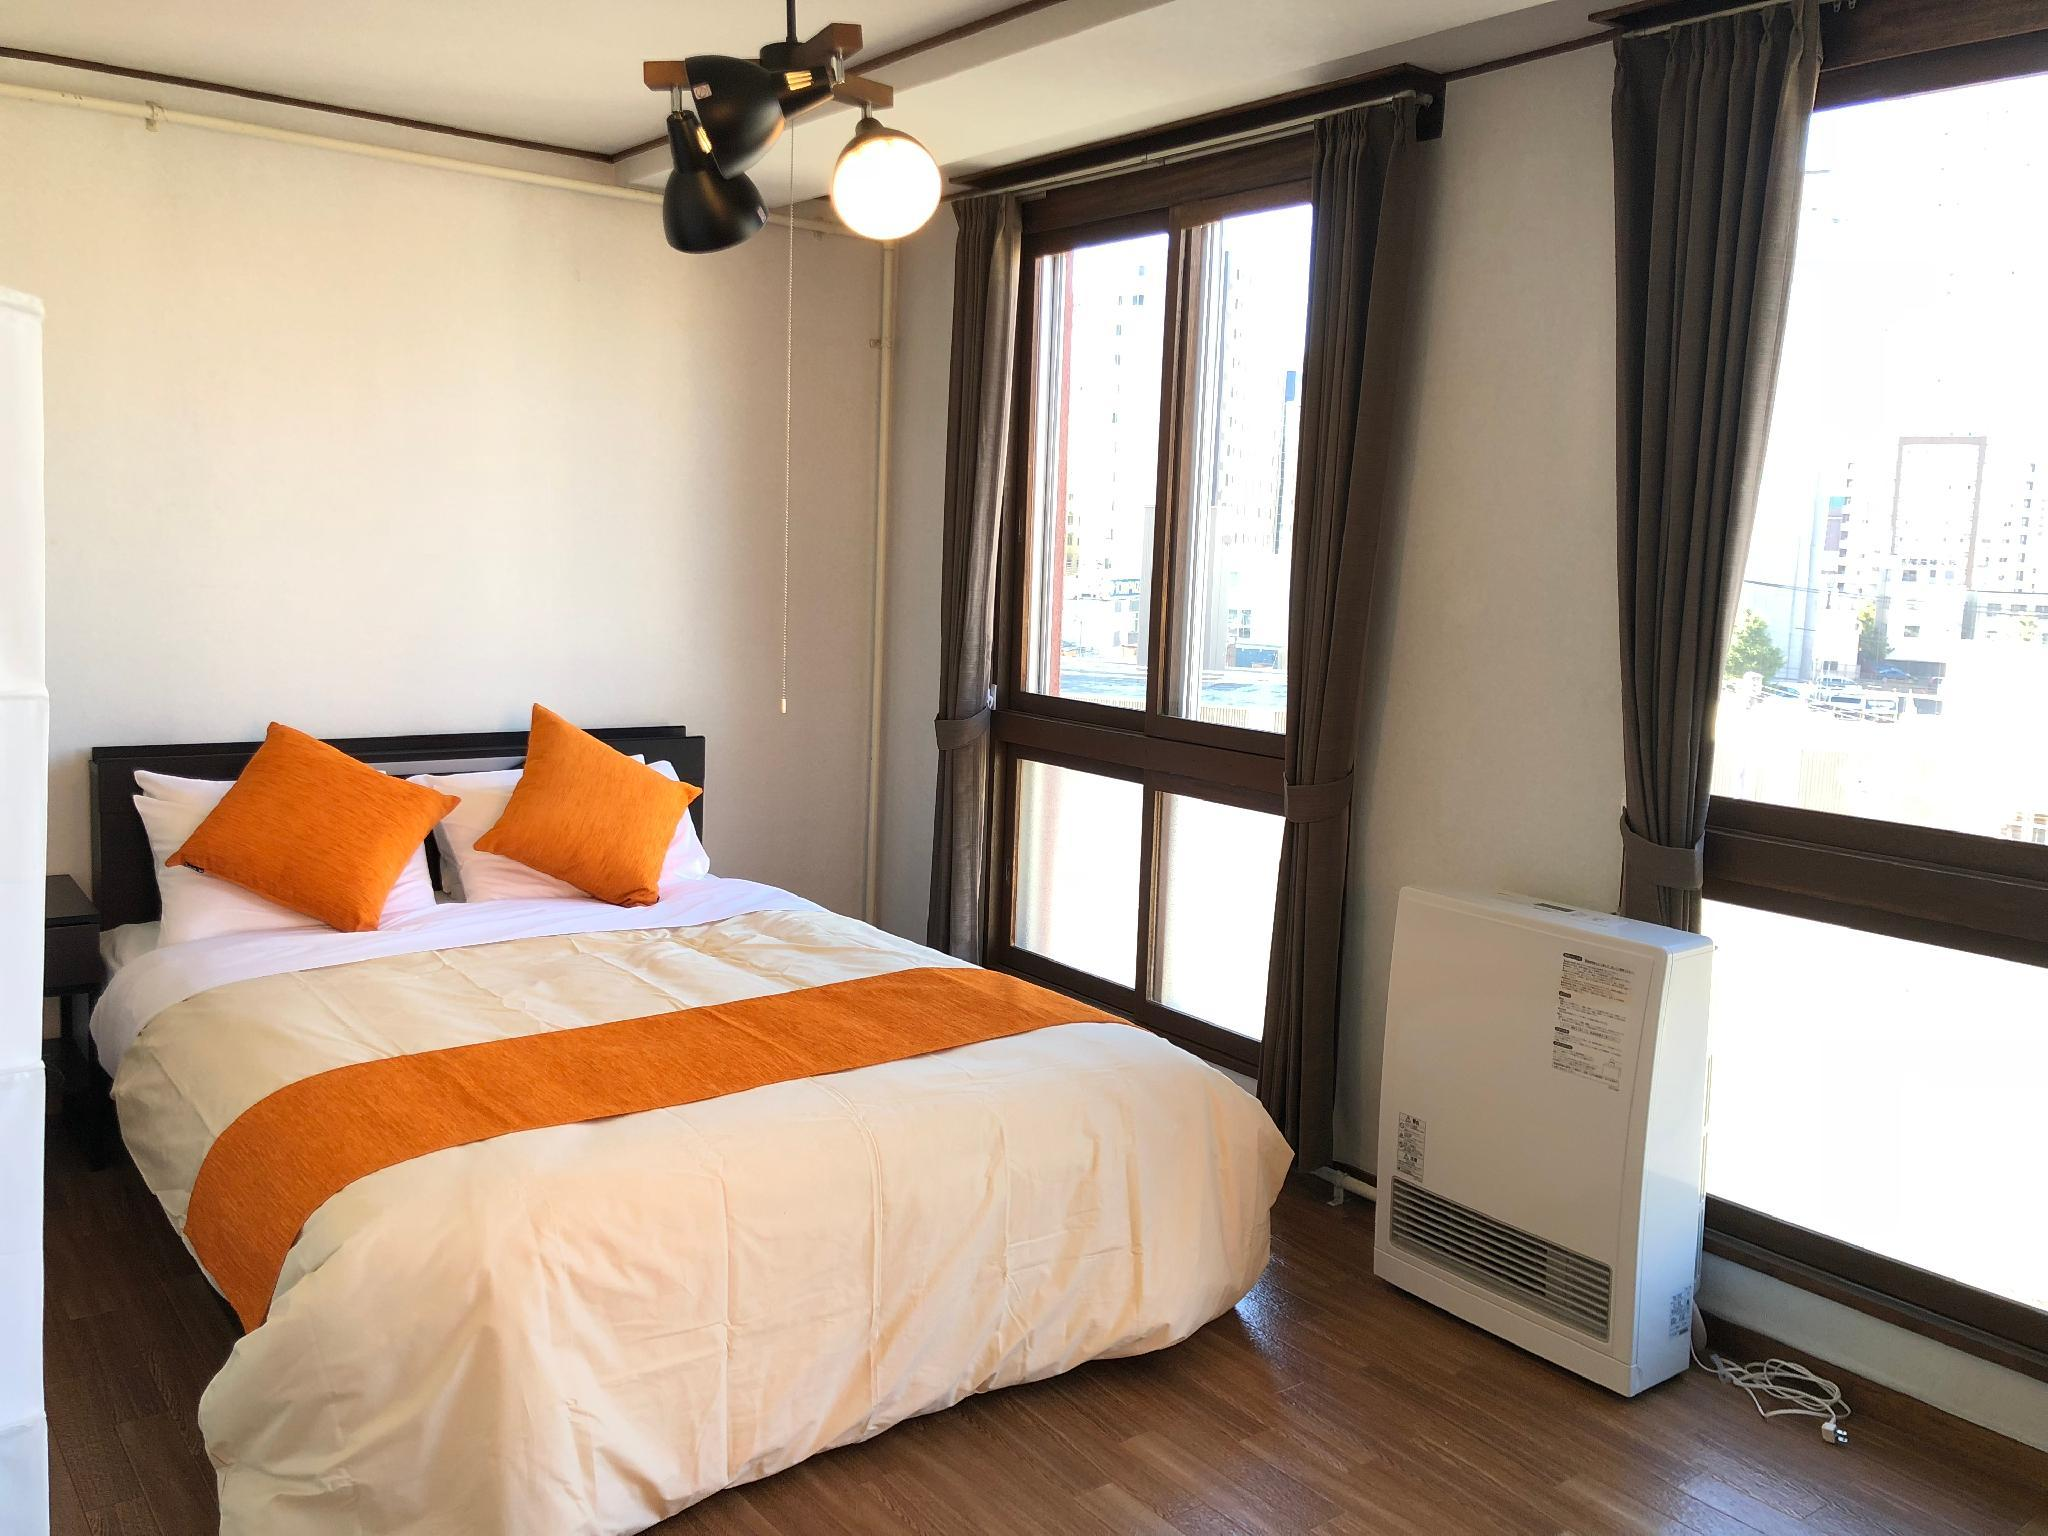 P55 1 Room Apartment In Sapporo